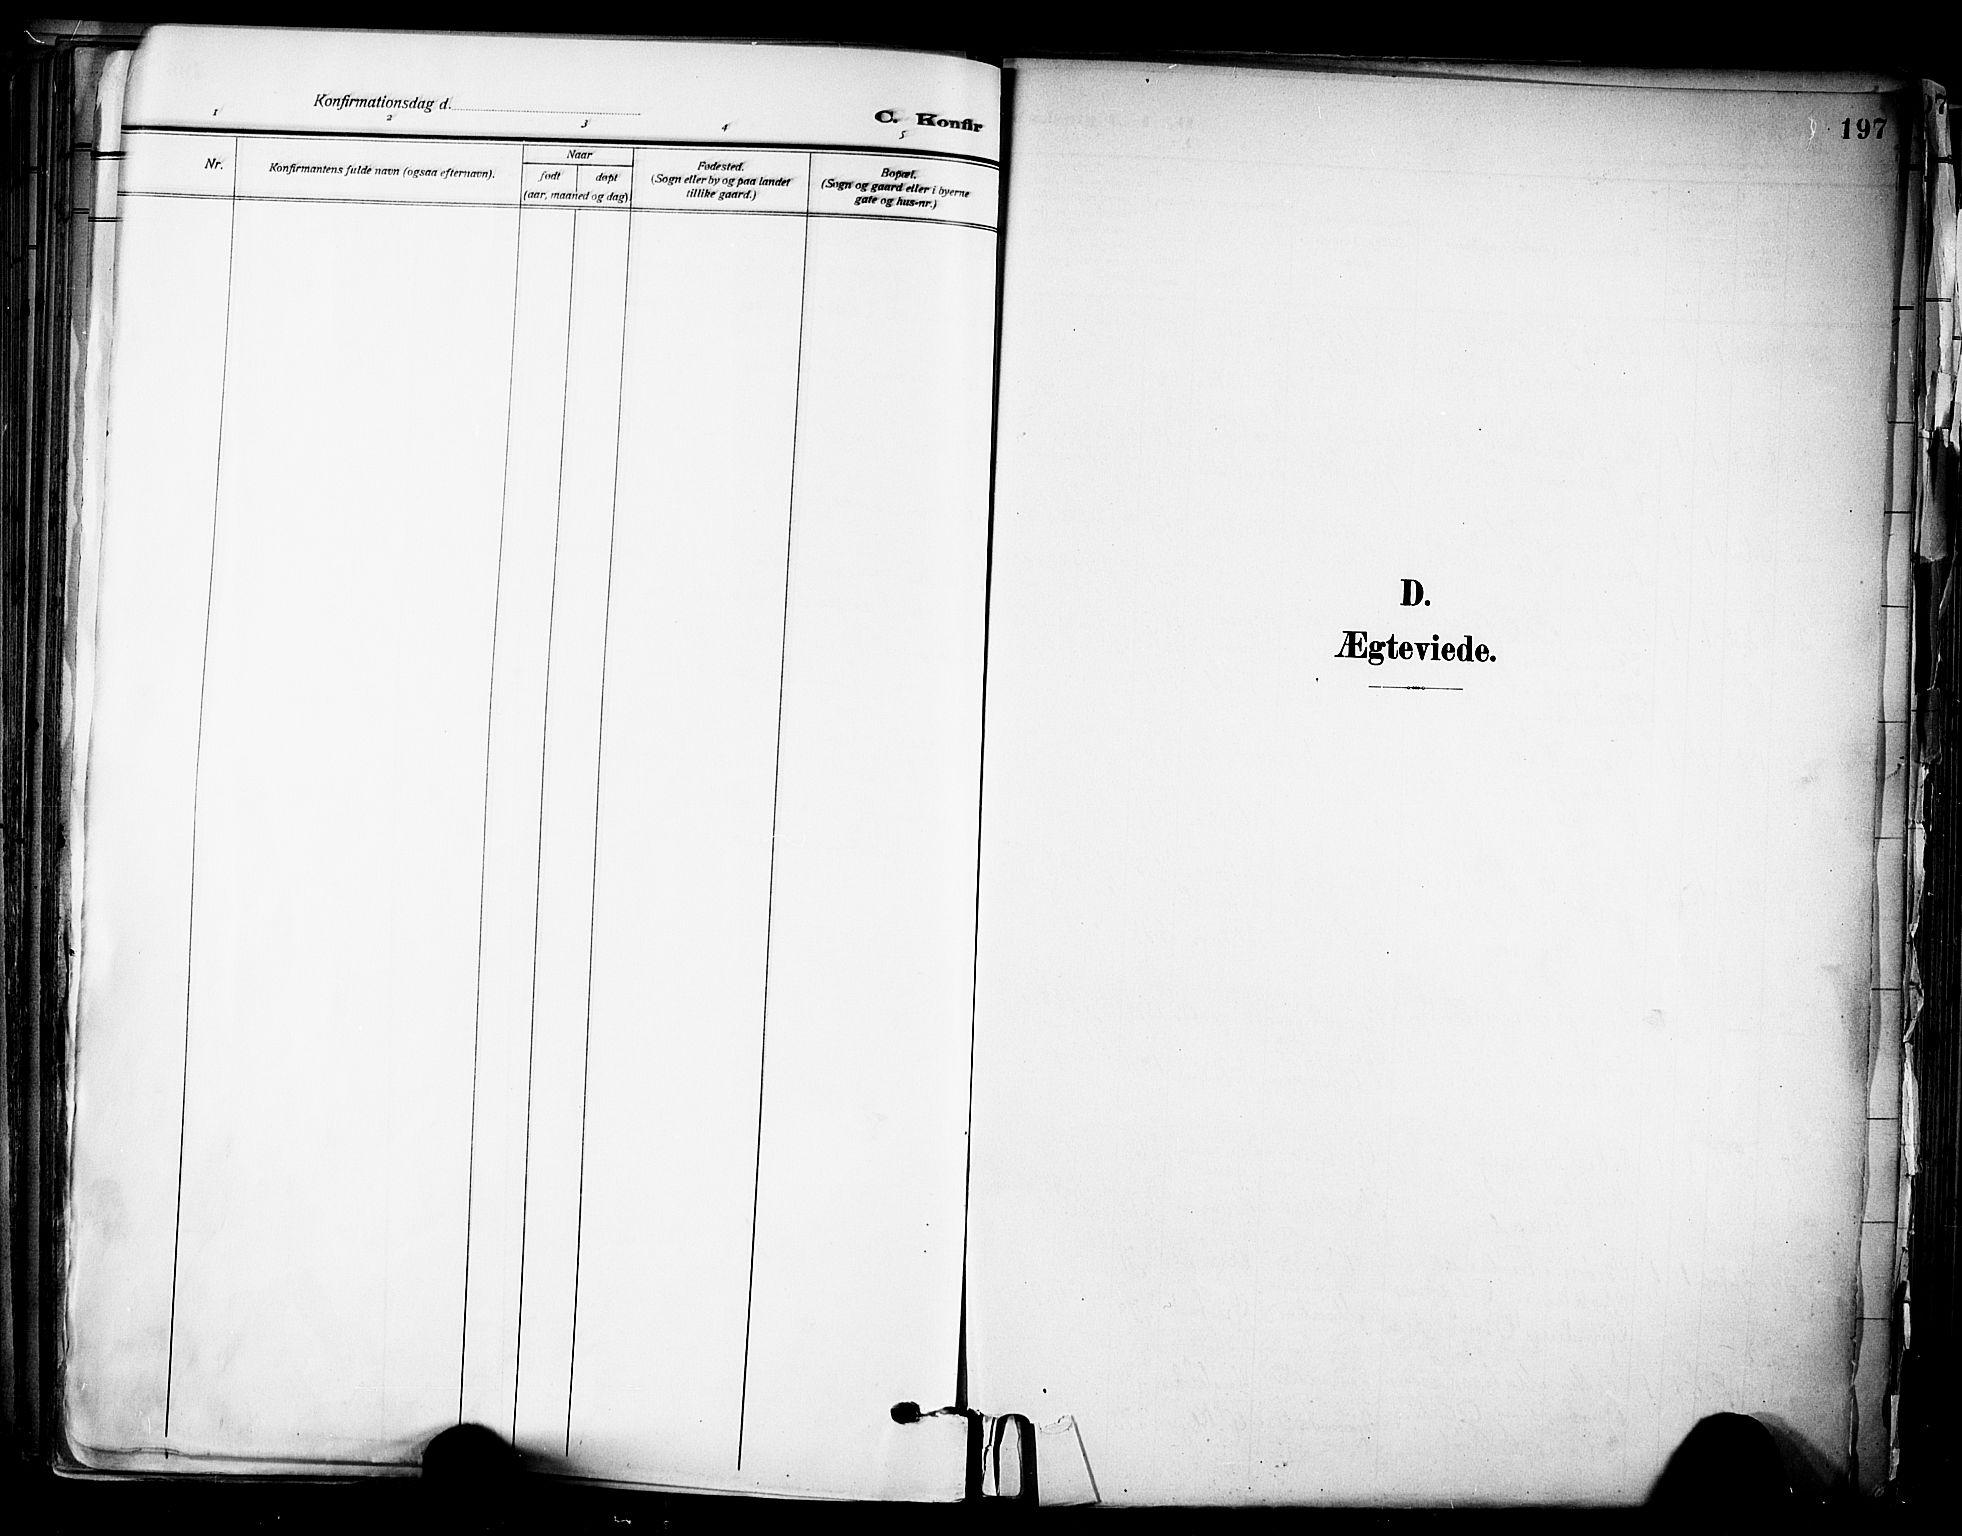 SAKO, Solum kirkebøker, F/Fa/L0011: Ministerialbok nr. I 11, 1898-1909, s. 197